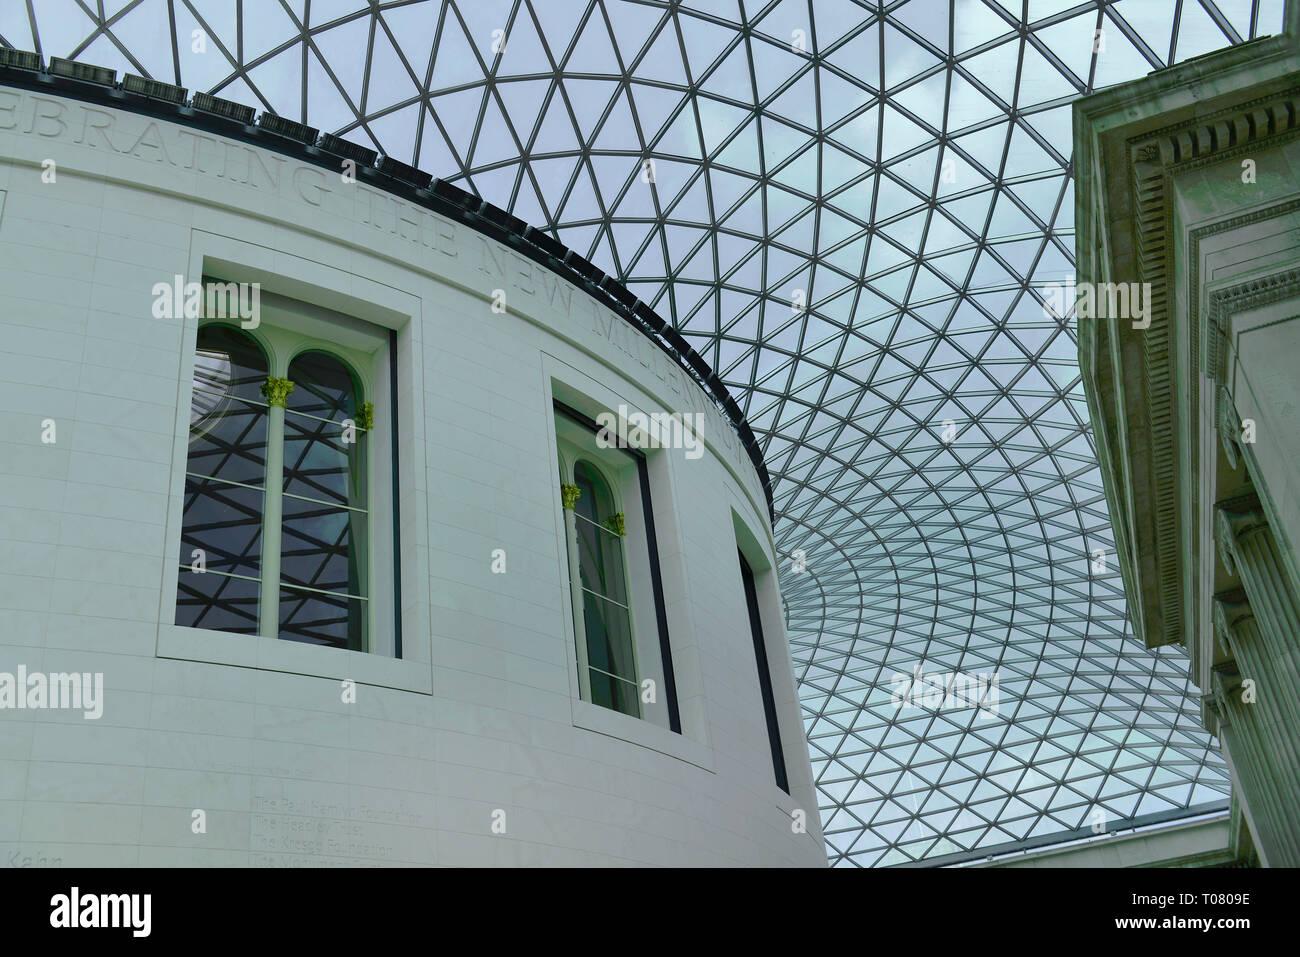 Lichthof, British Museum, Great Russell St, Bloomsbury, London, Grossbritannien Stock Photo